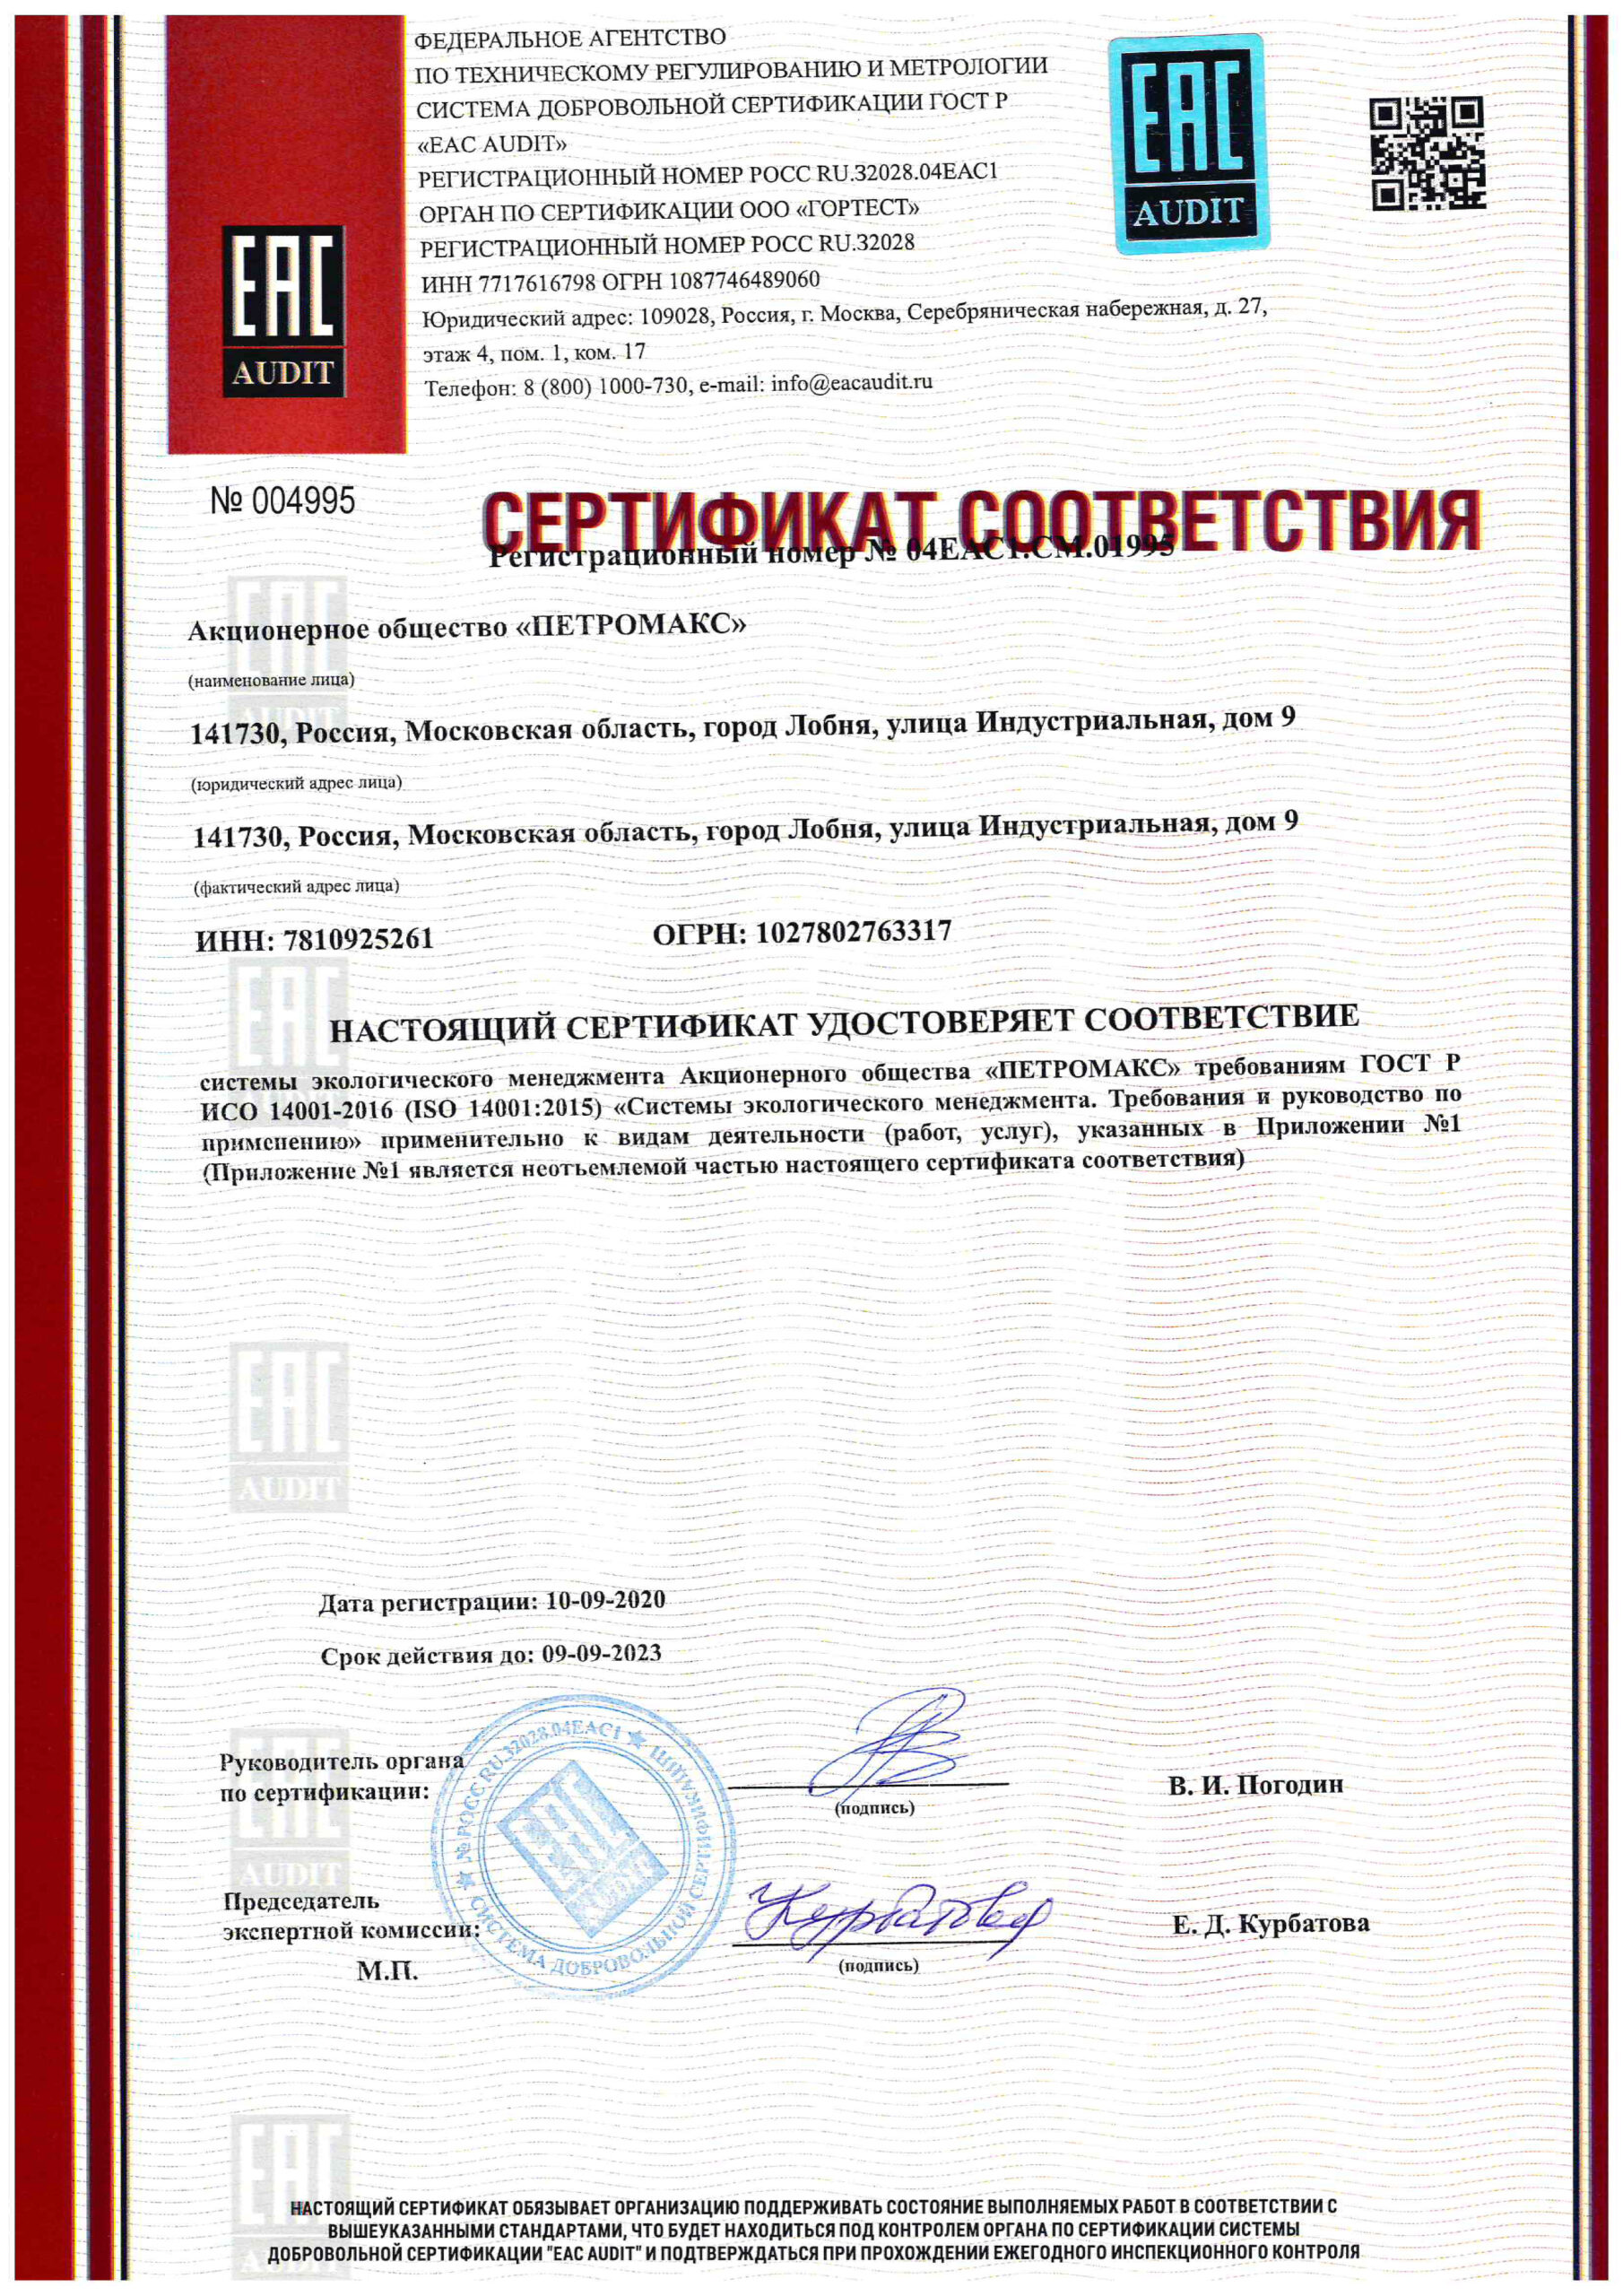 sertifikat-sootvetstviya-%e2%84%9604eac1-cm-01995-1